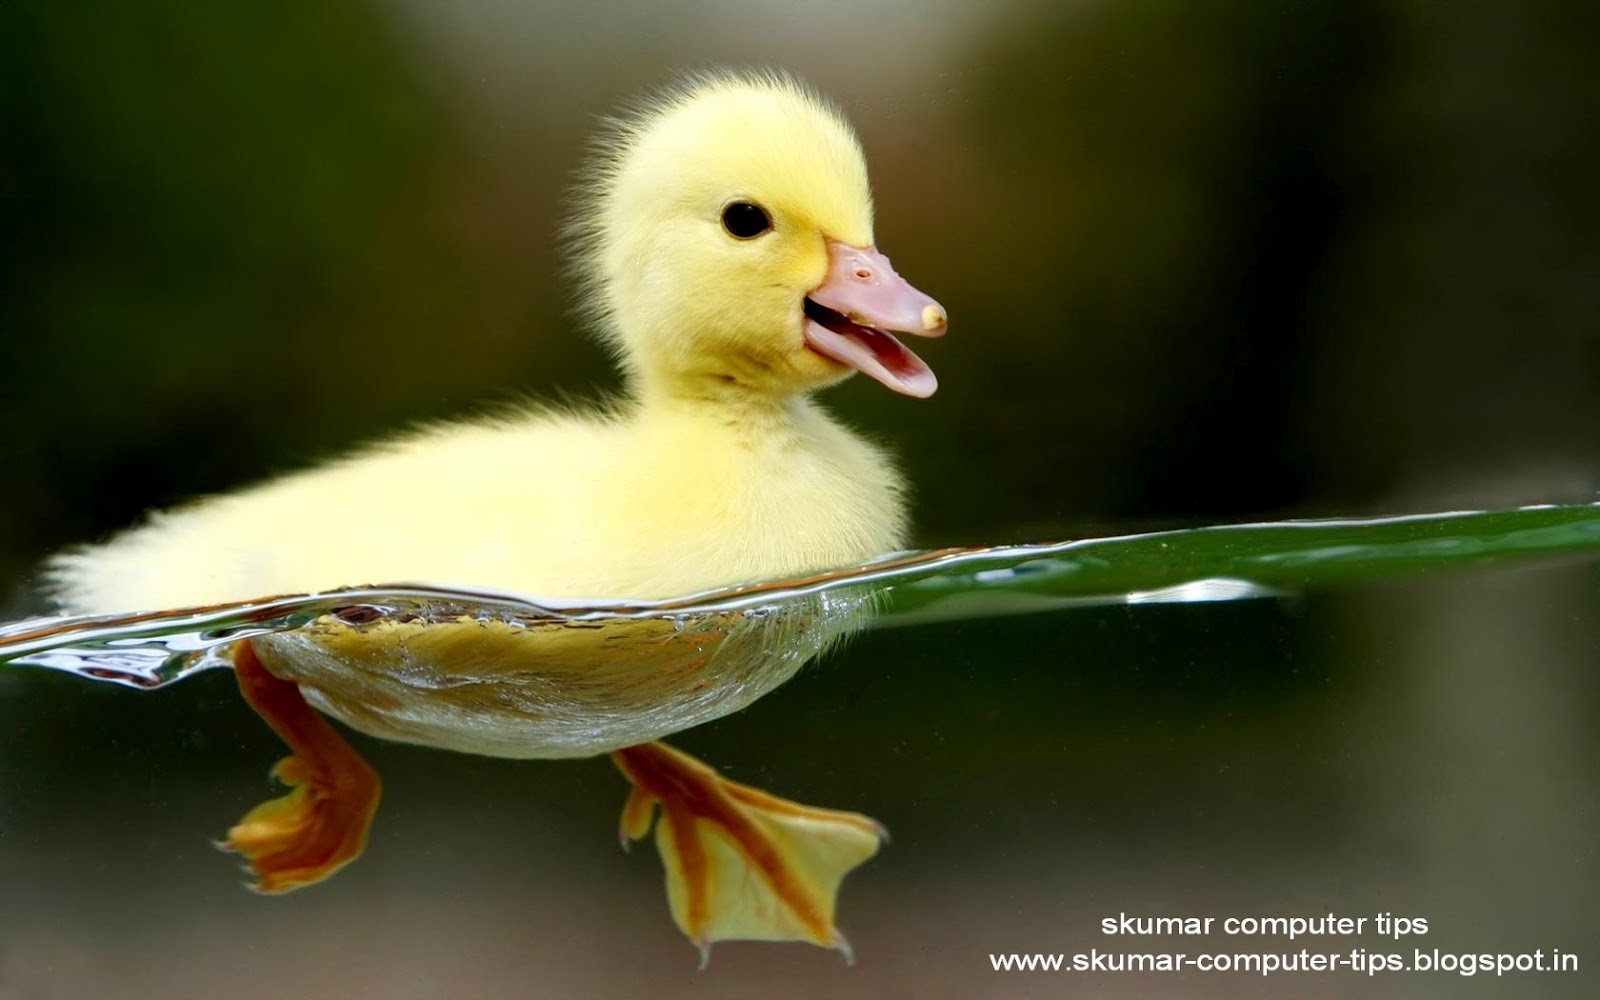 http://1.bp.blogspot.com/-z6i4ifKk75g/T9Swja2LN_I/AAAAAAAAEdY/50GEGtXpL5U/s1600/Duckling_hd_wallpaper.jpg